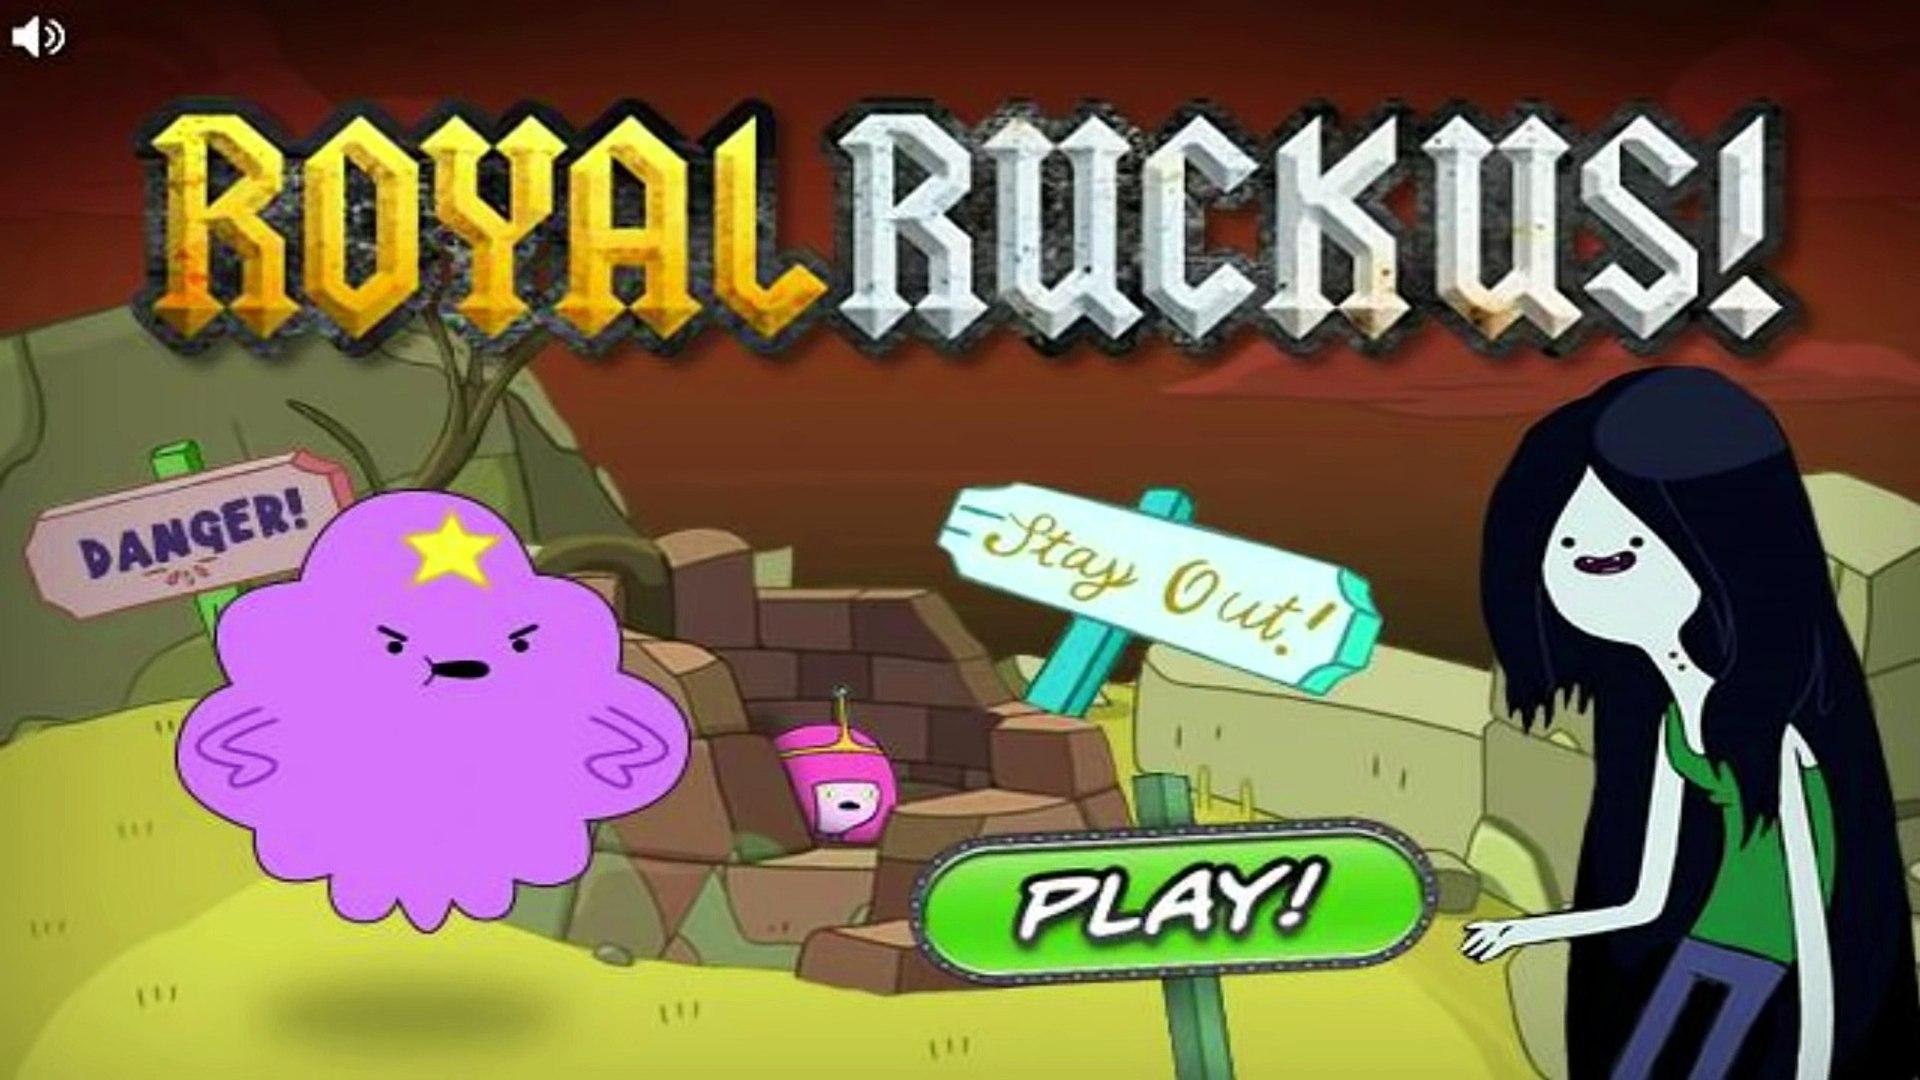 Adventure Time Royal Ruckus - Adventure Time Games